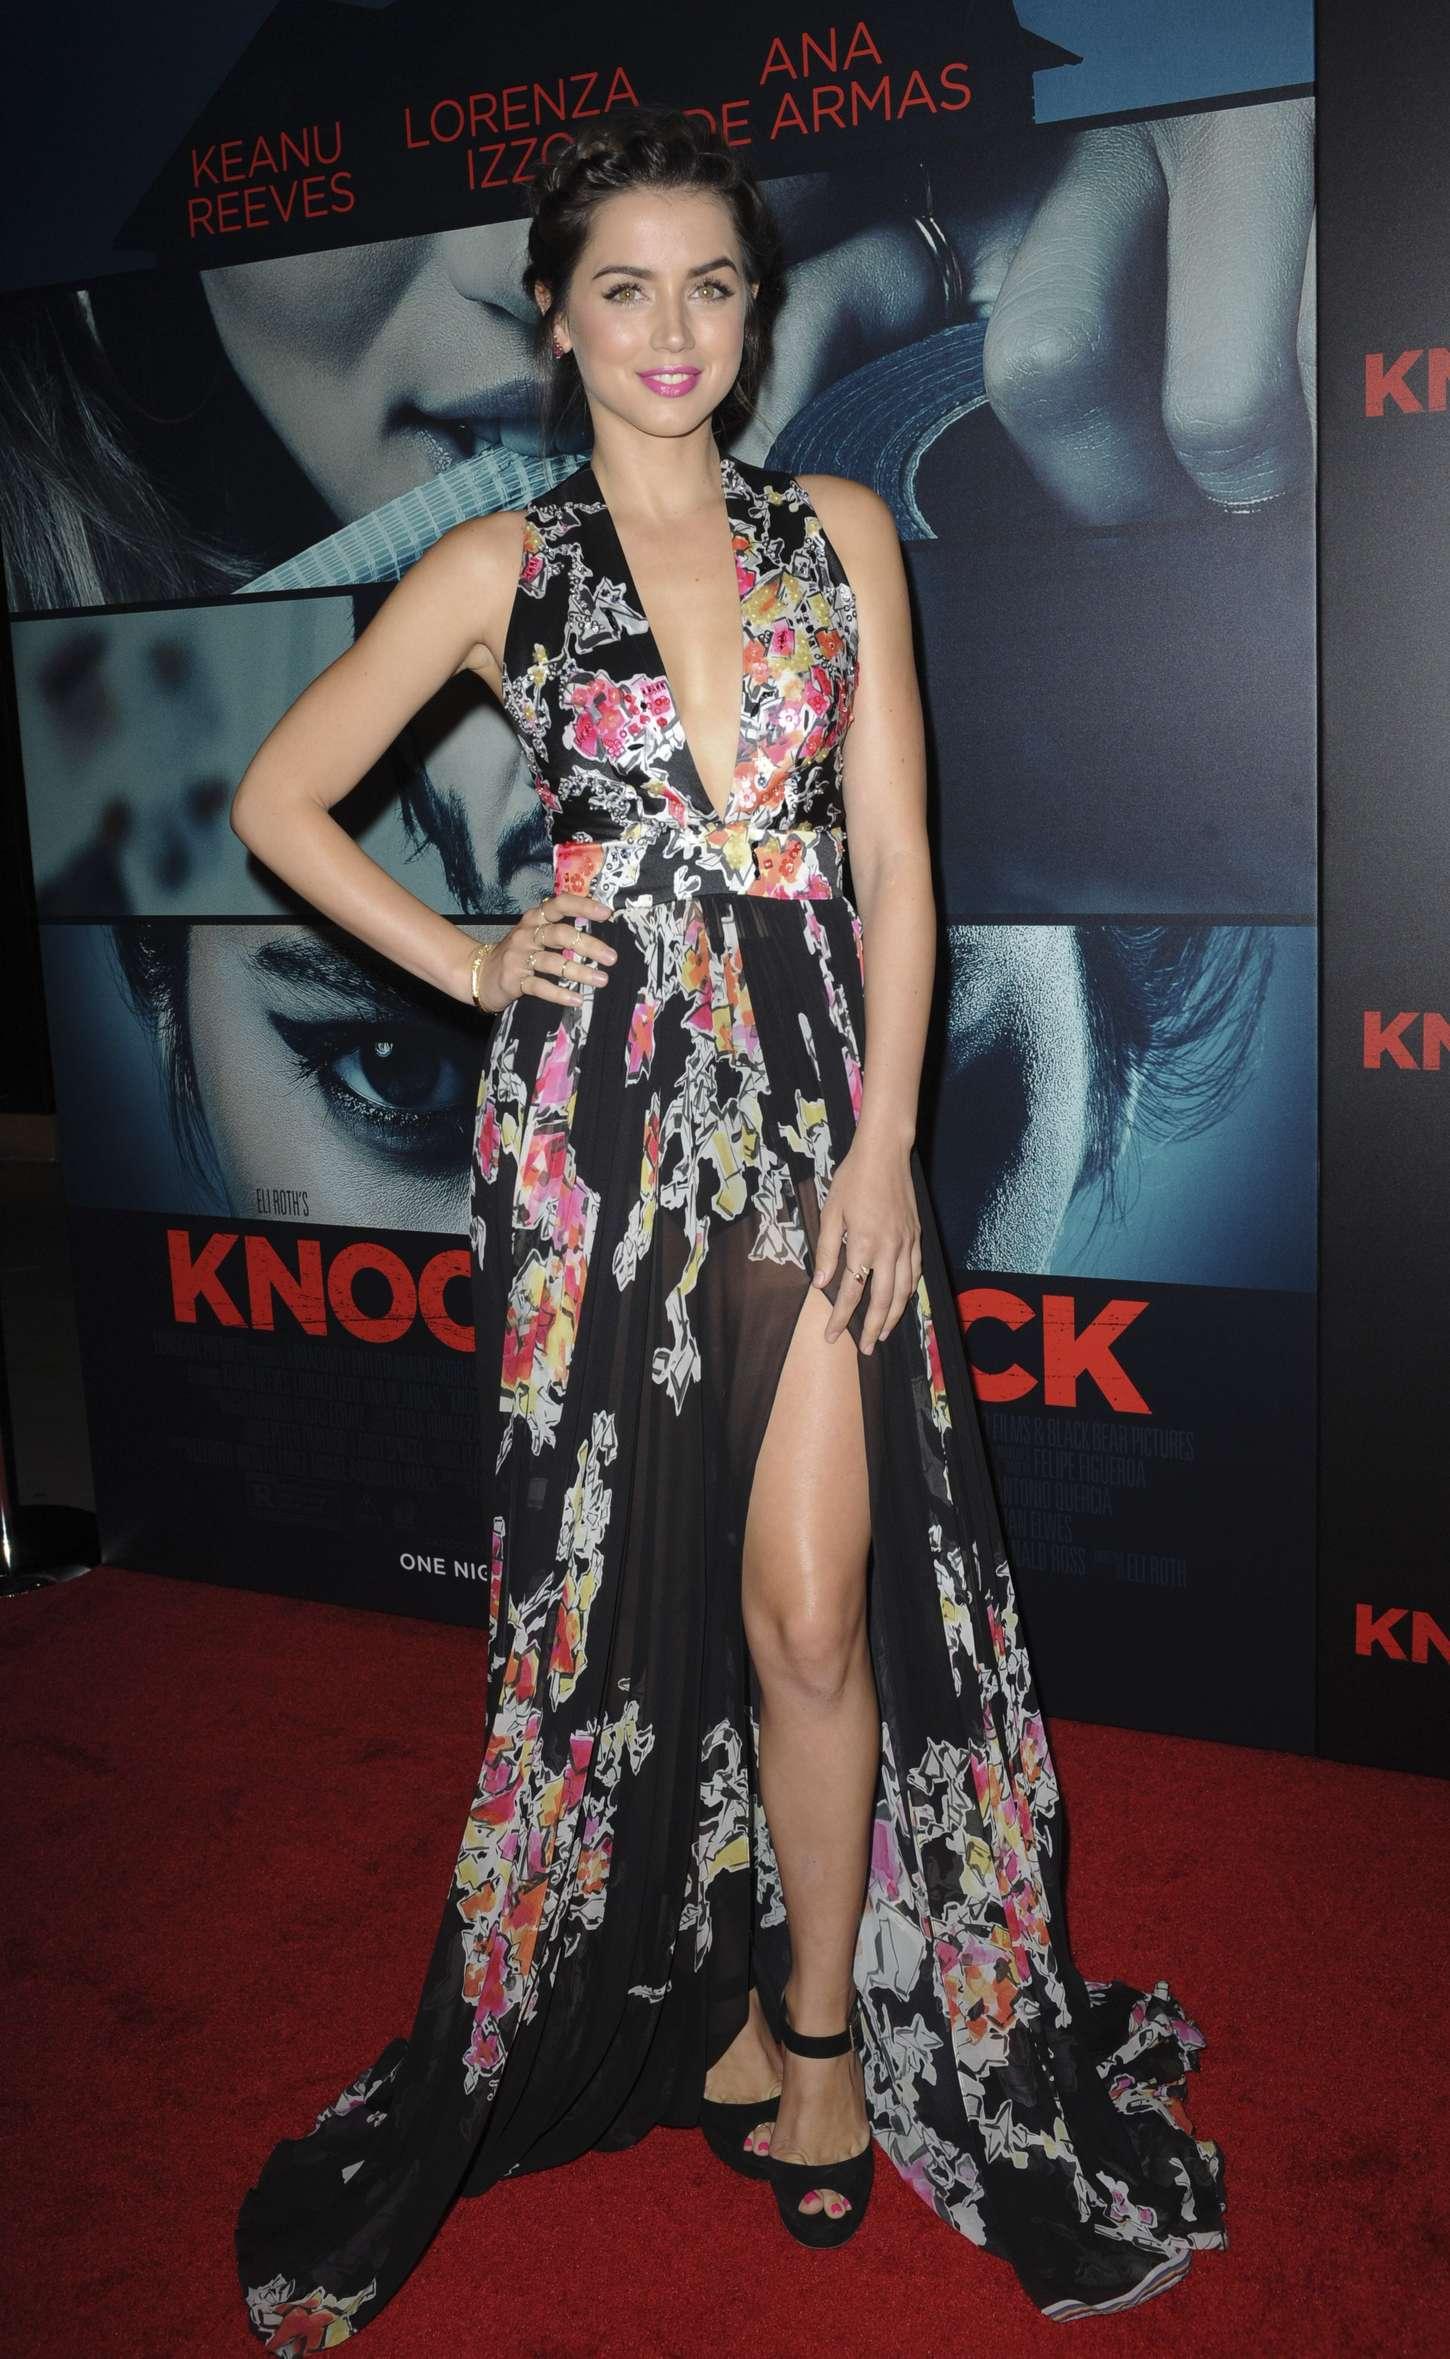 Ana de Armas Knock Knock Premiere in Hollywood